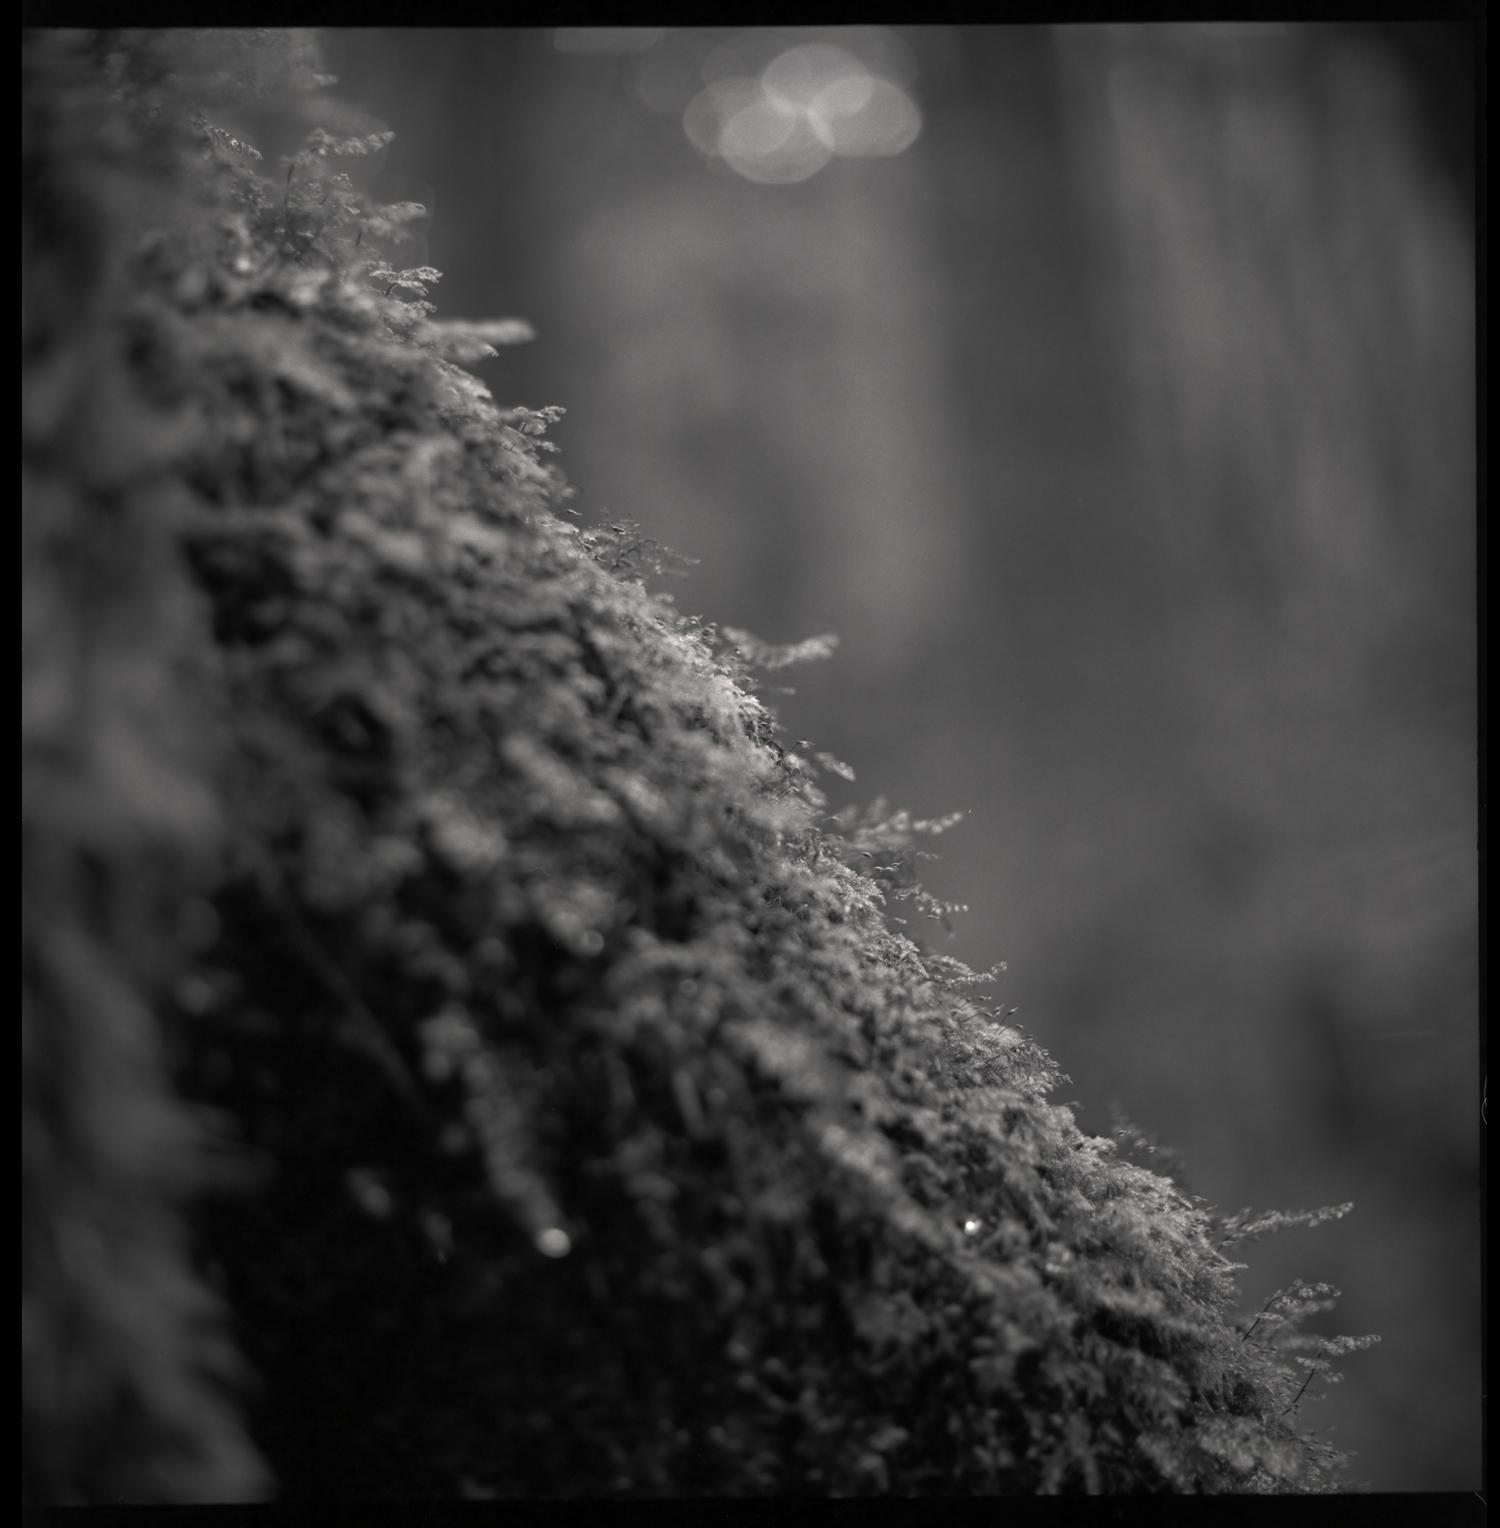 forest-bw-12.jpg